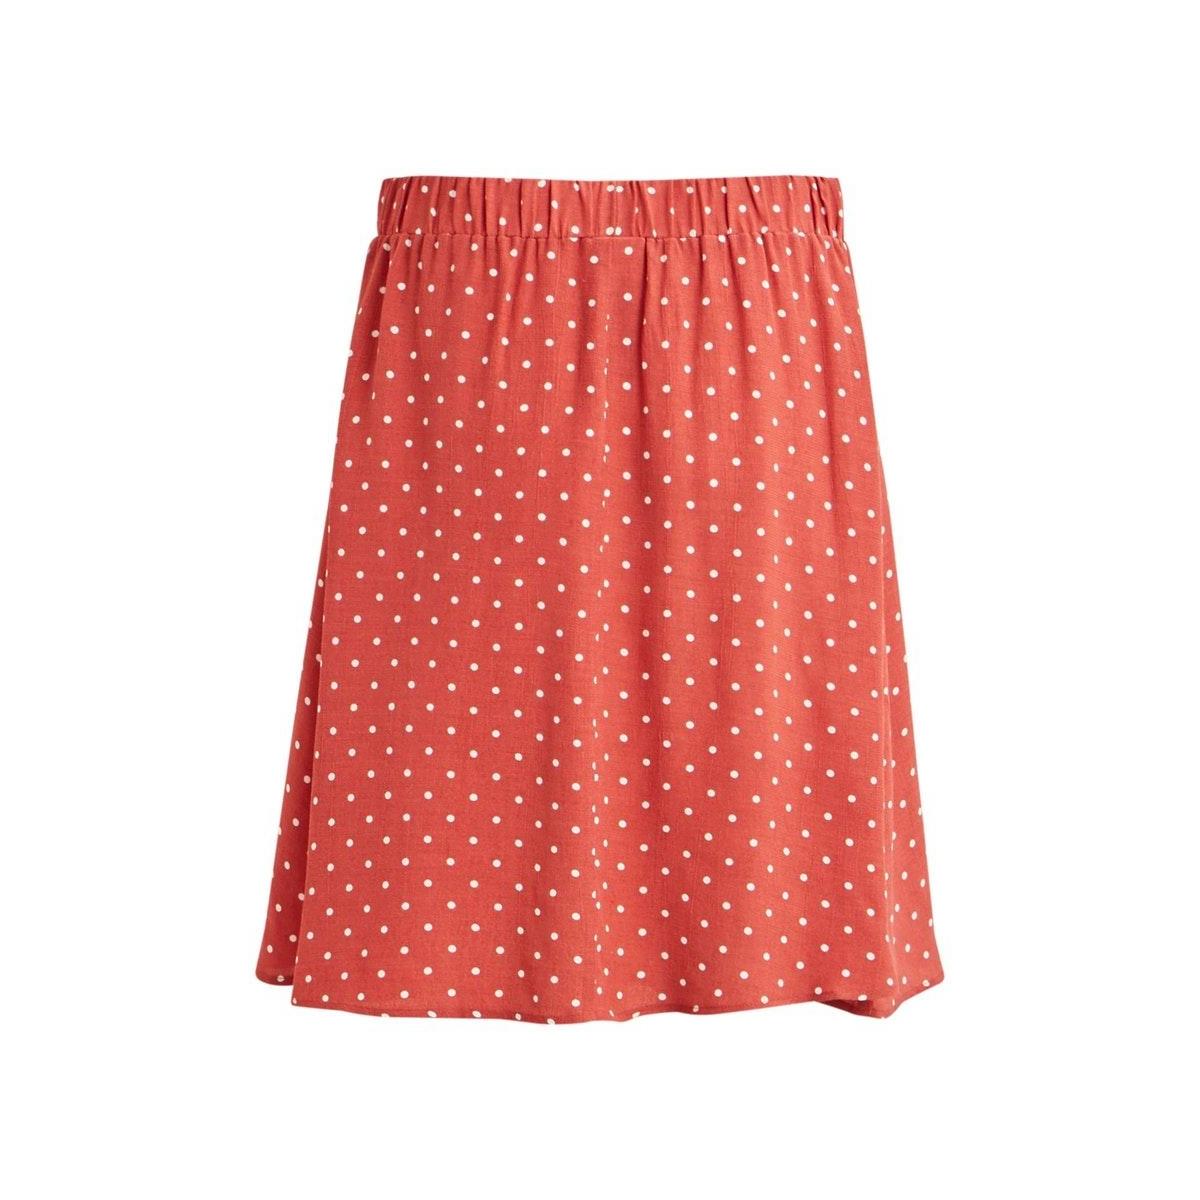 viprimera skirt-fav lux 14055568 vila rok dusty cedar/snow white